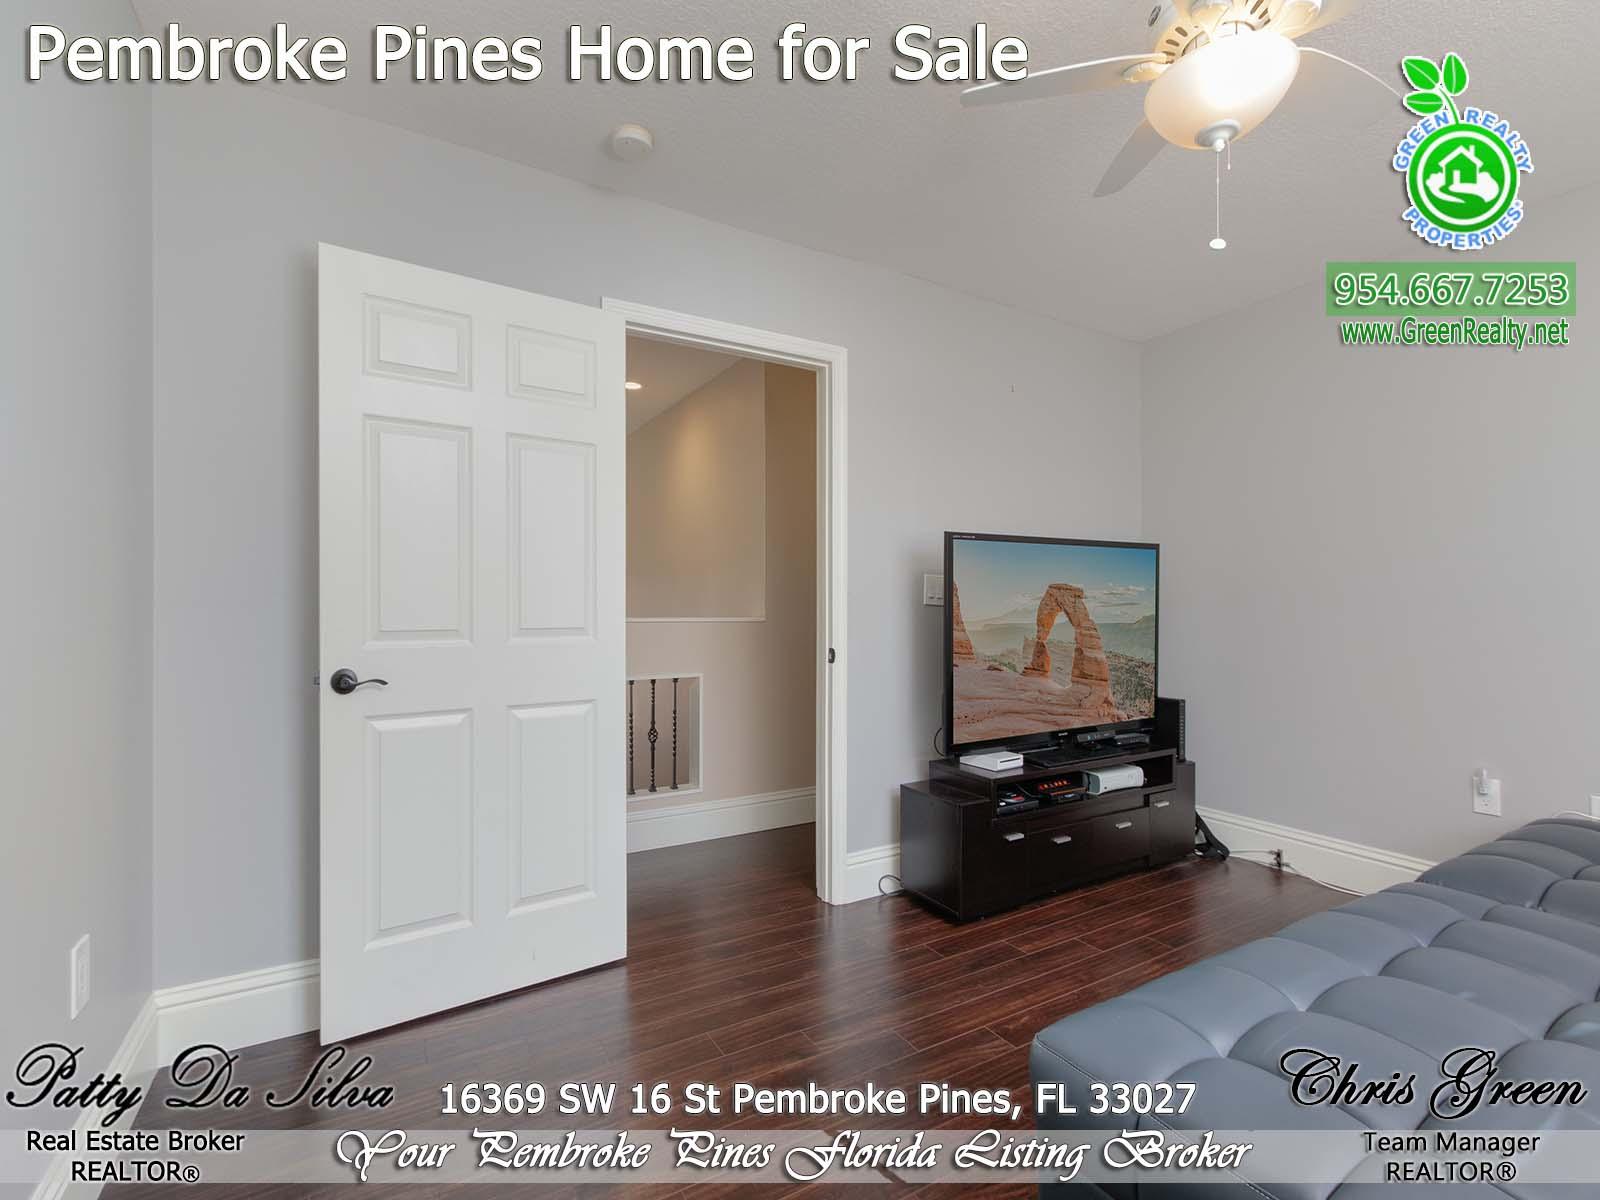 18 Pembroke Pines Realtor Broker Patty Da Silva south florida listing (18)